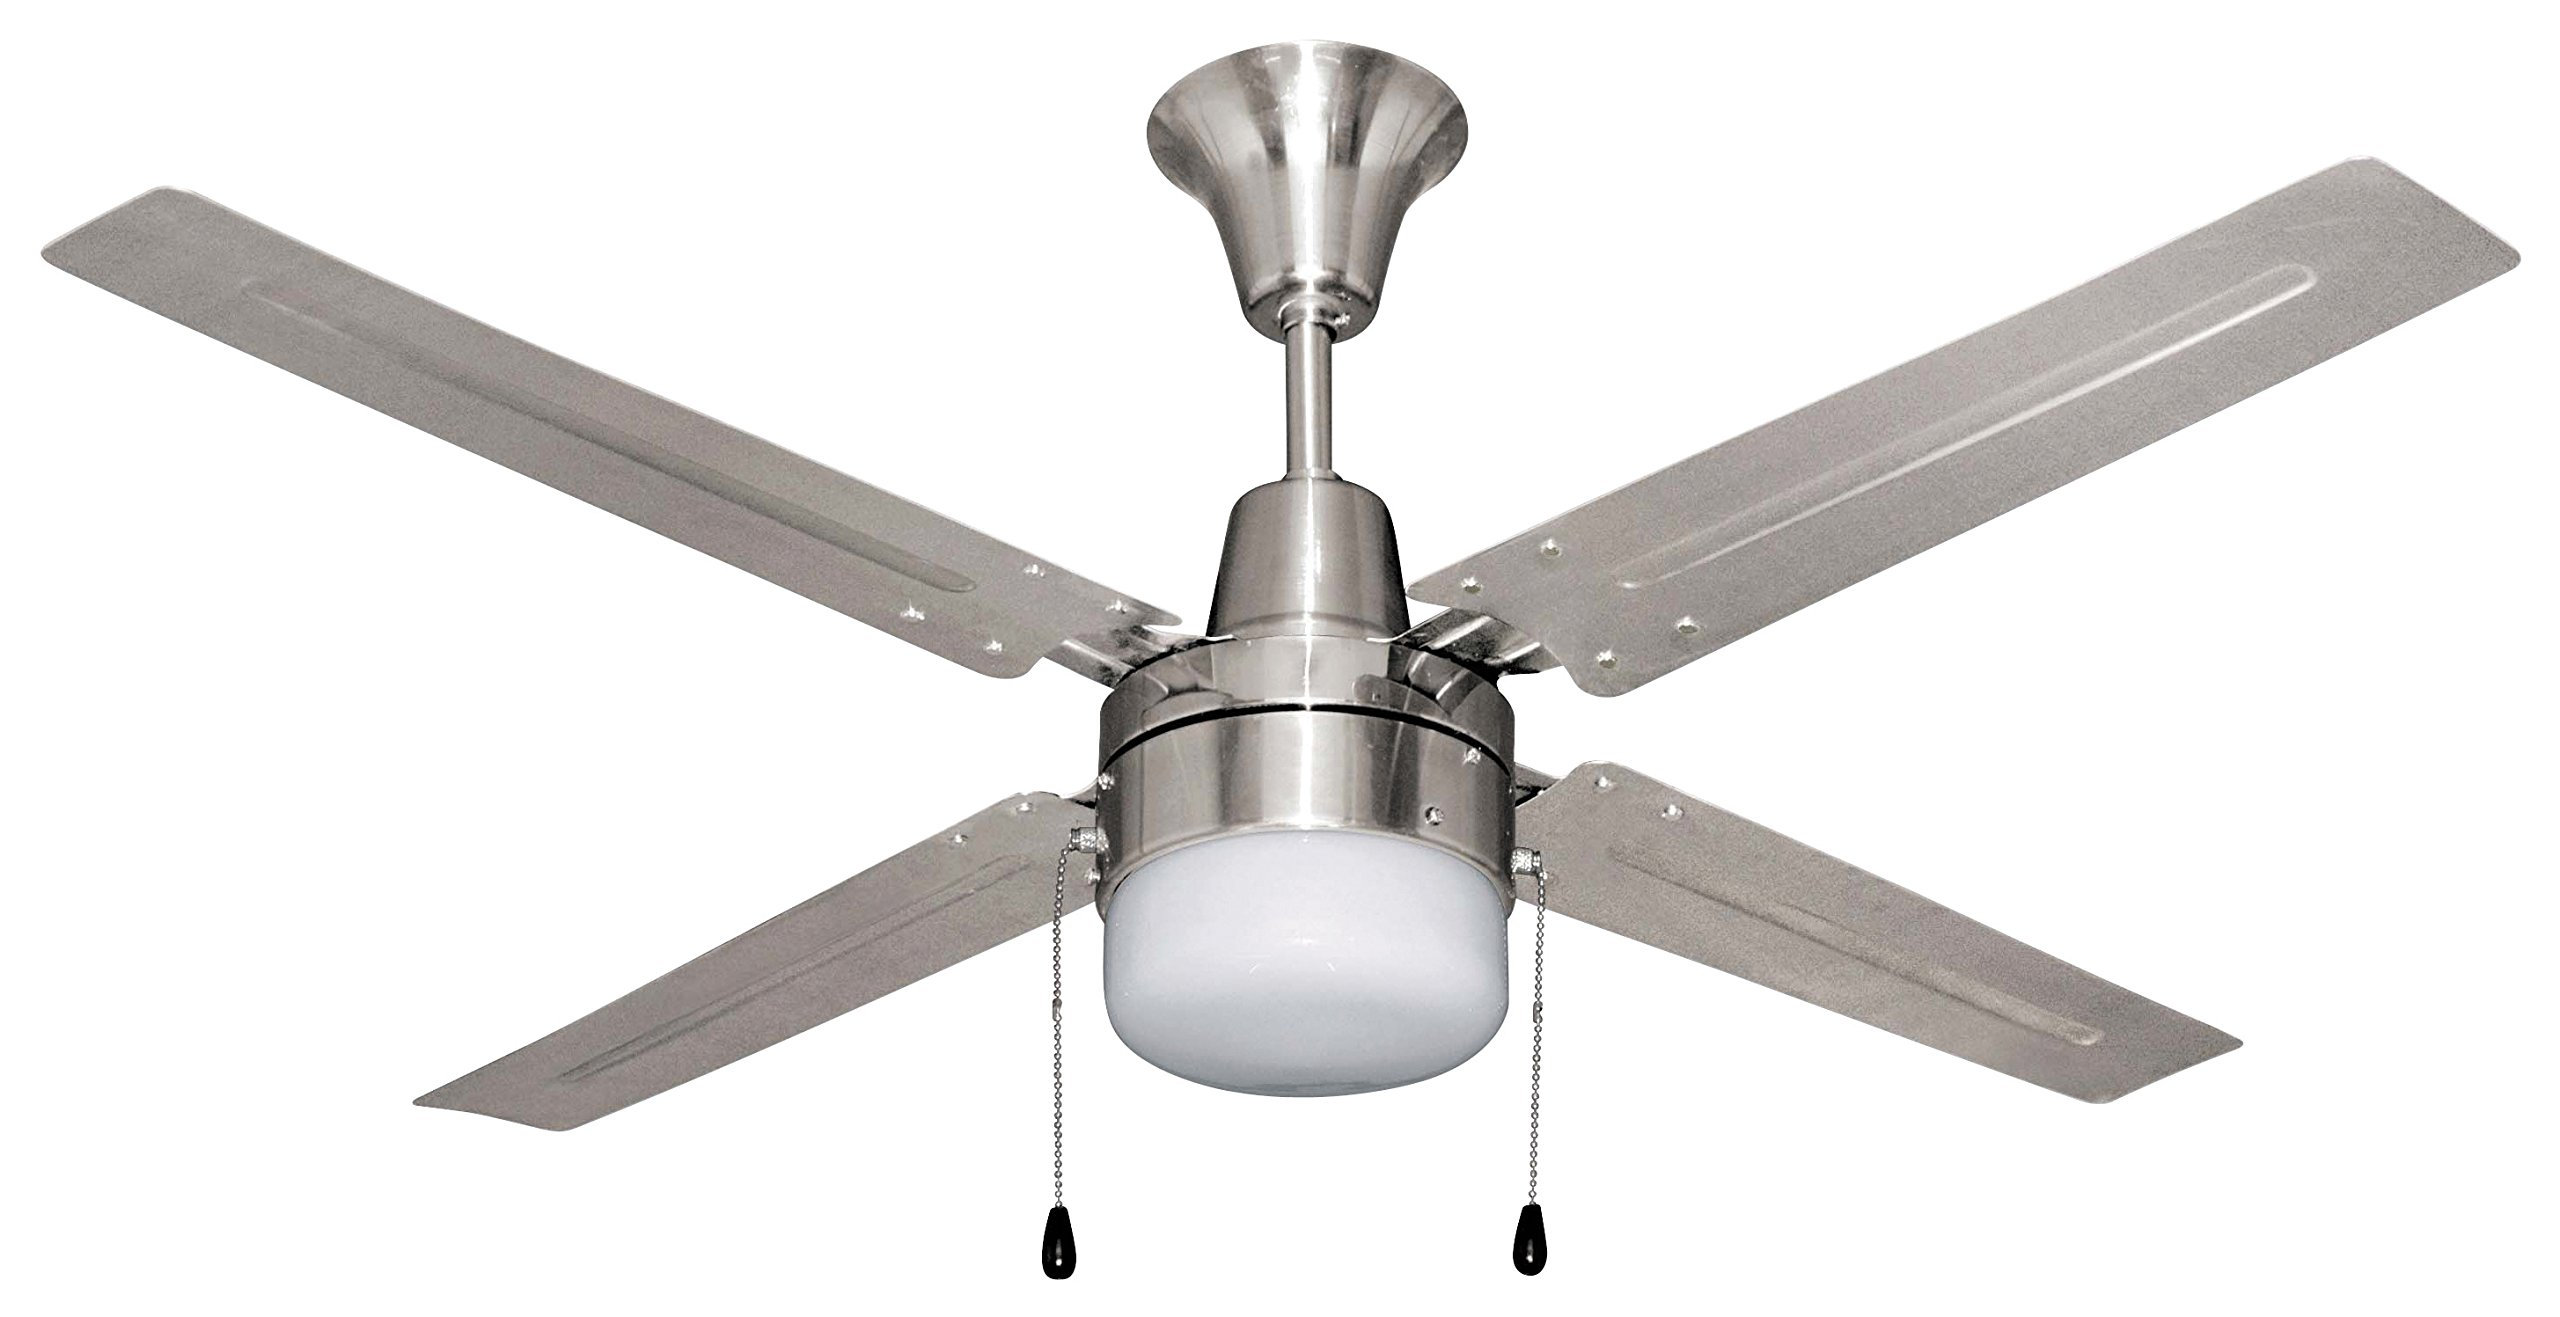 Four Blade Fan : Litex urbana inch ceiling fan with four brushed chrome